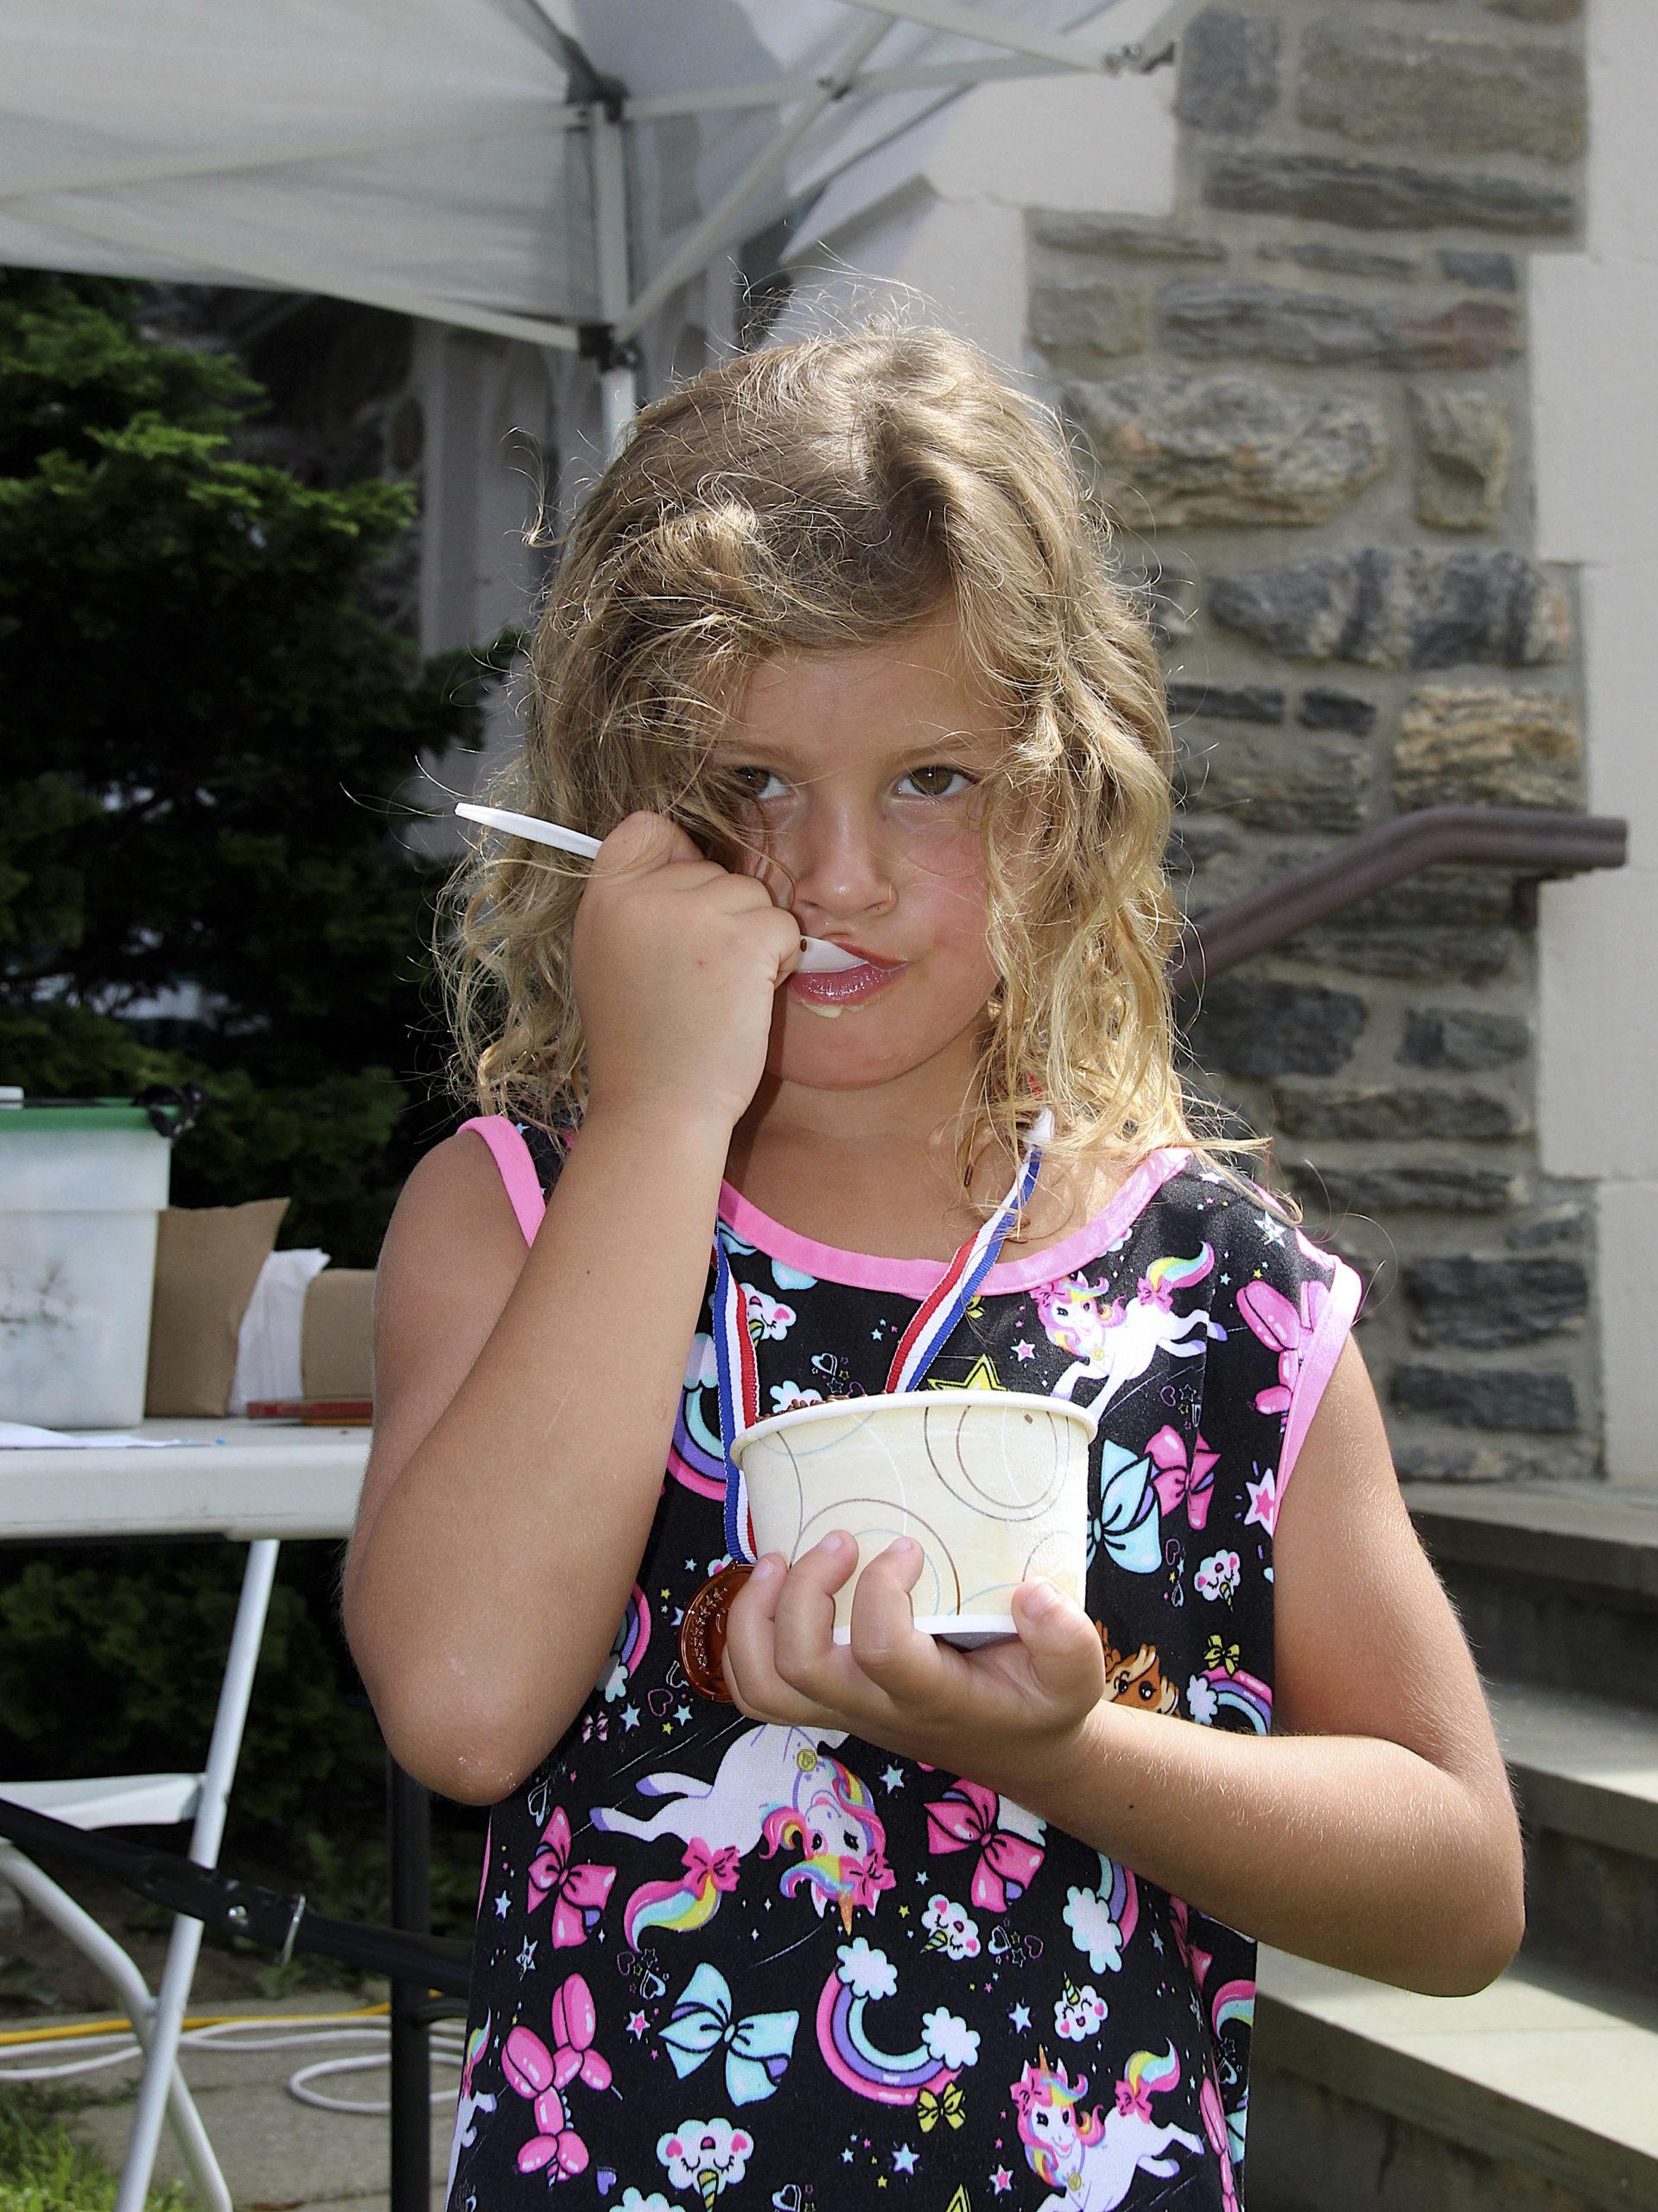 Paisley Bennett enjoys some ice cream at the St. Luke's Episcopal Church Fair on Saturday.  KYRIL BROMLEY